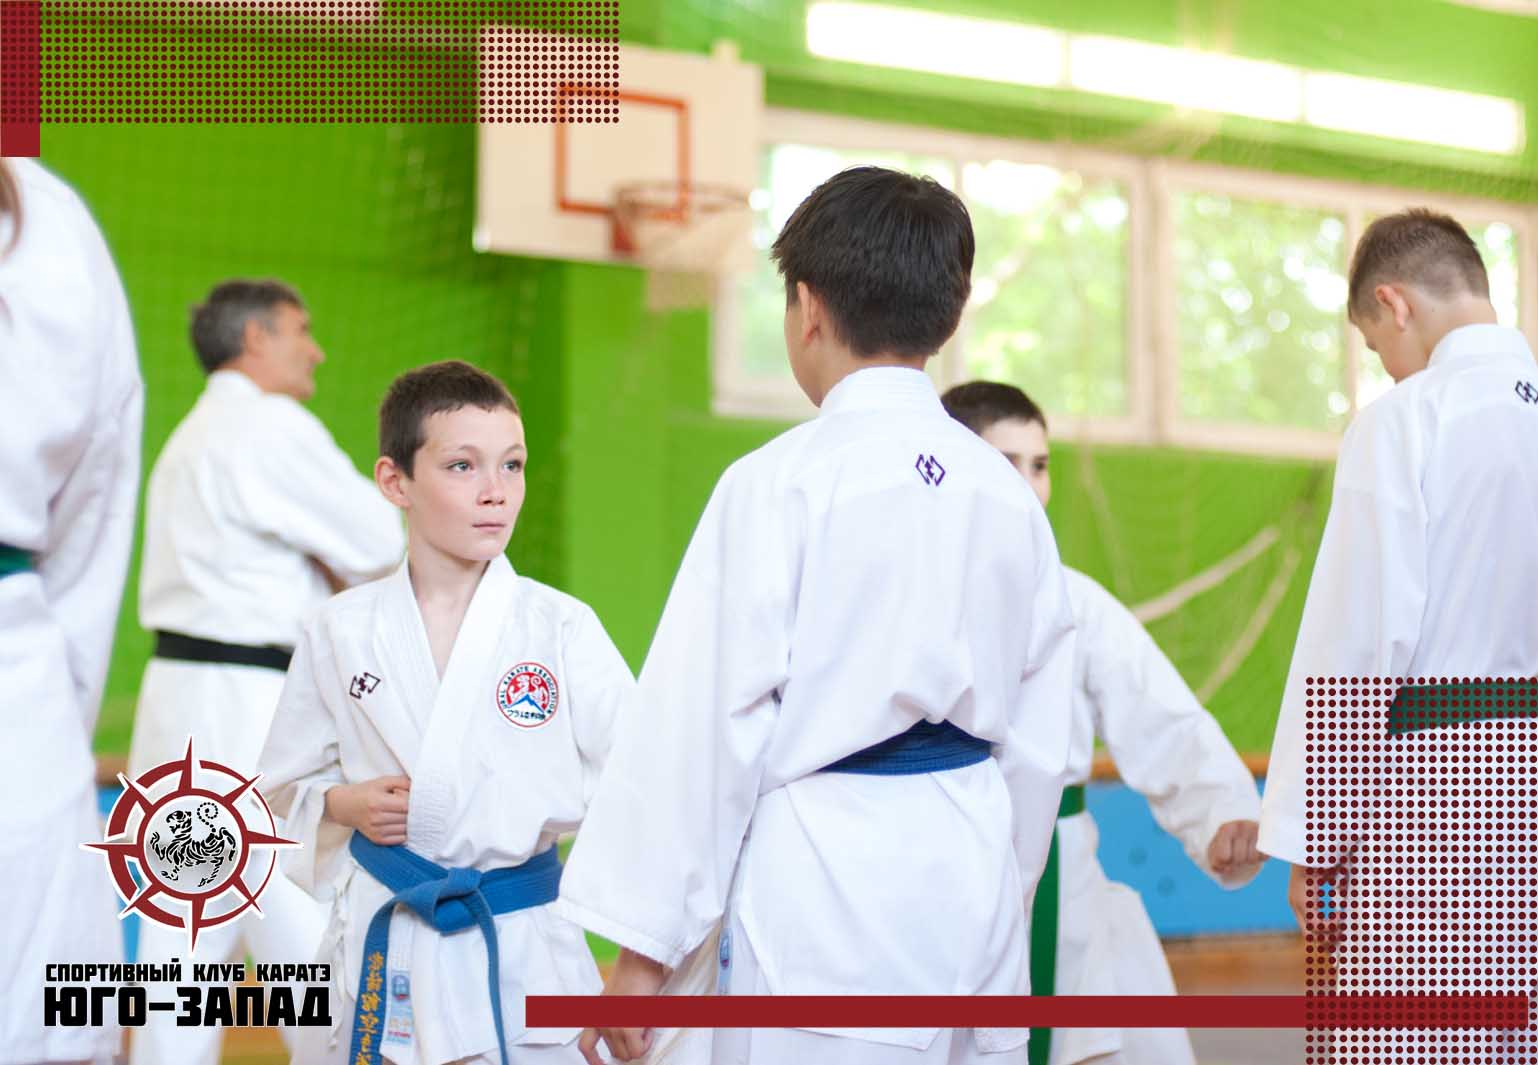 семинар по каратэ у детей